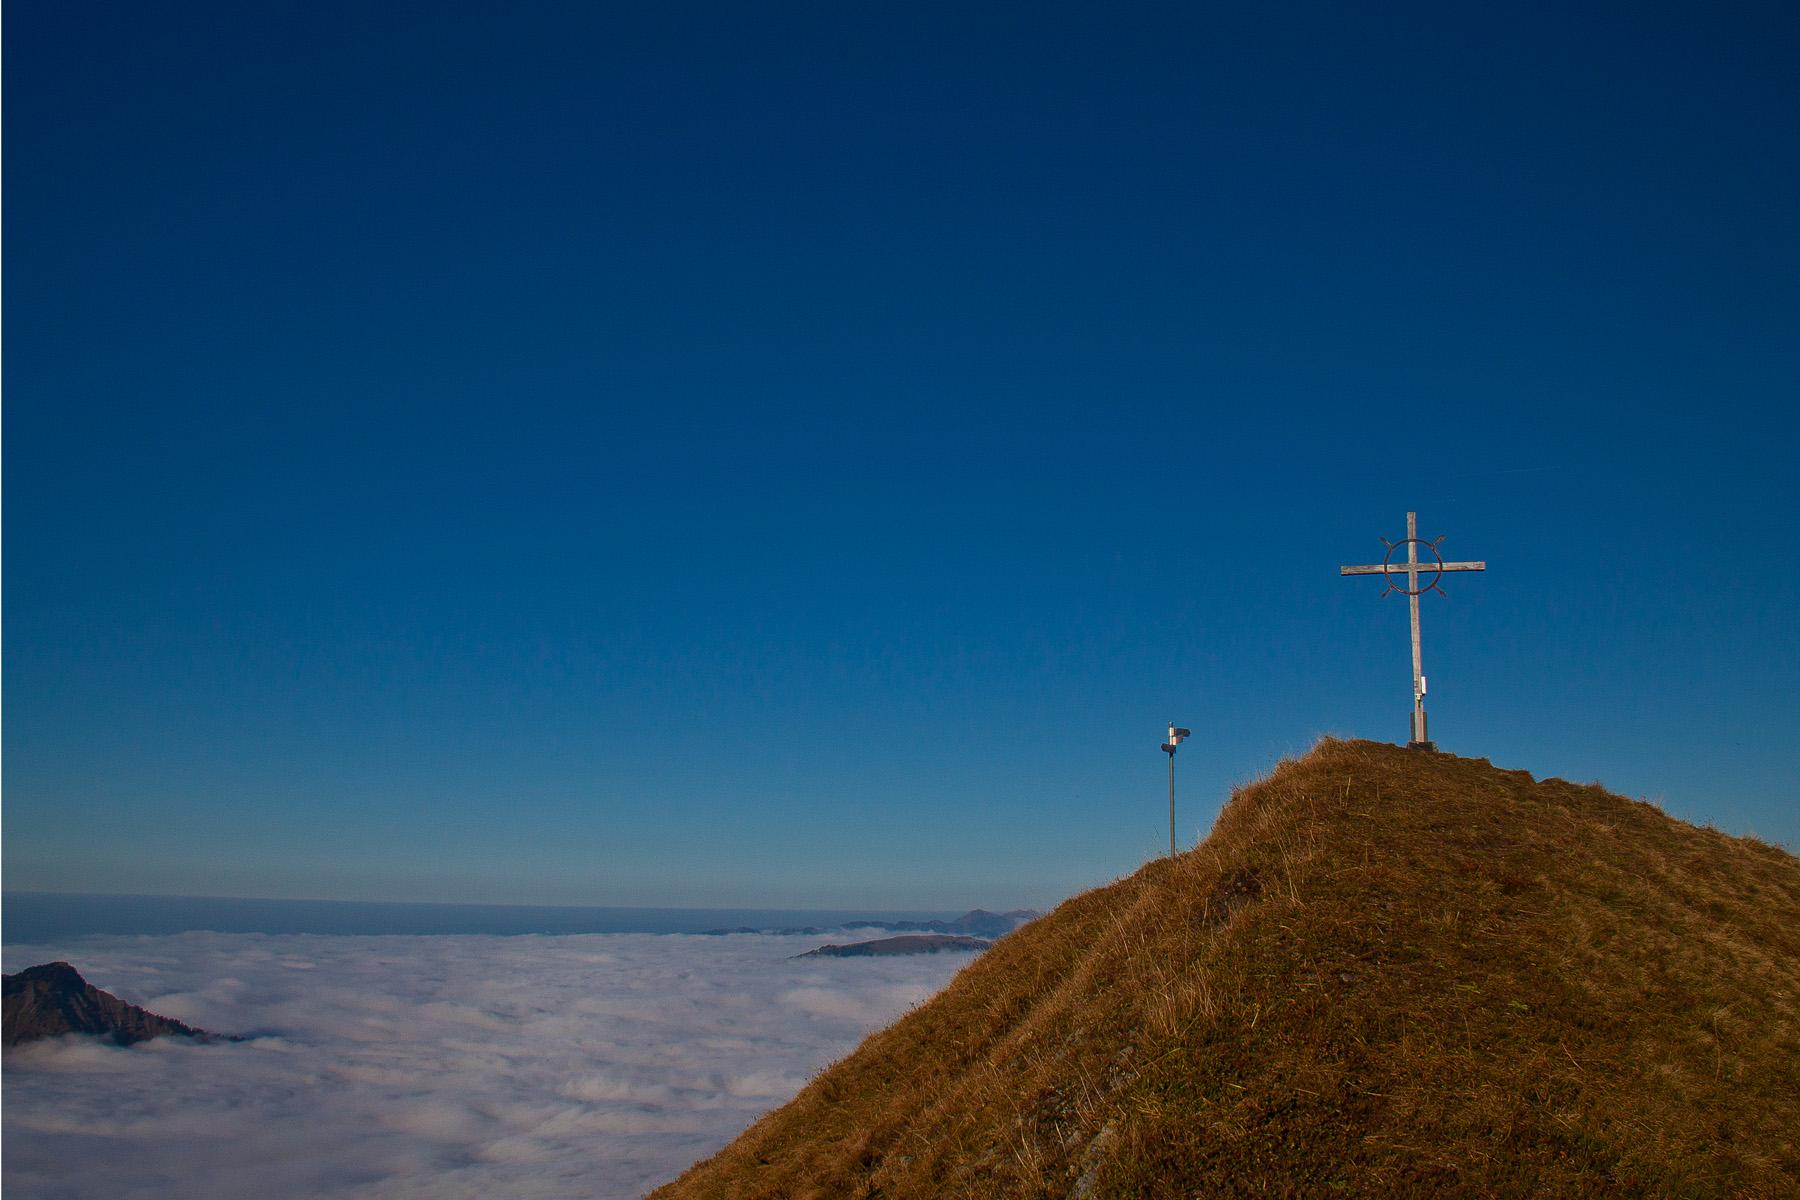 Gipfelkreuz Sünsrspitze